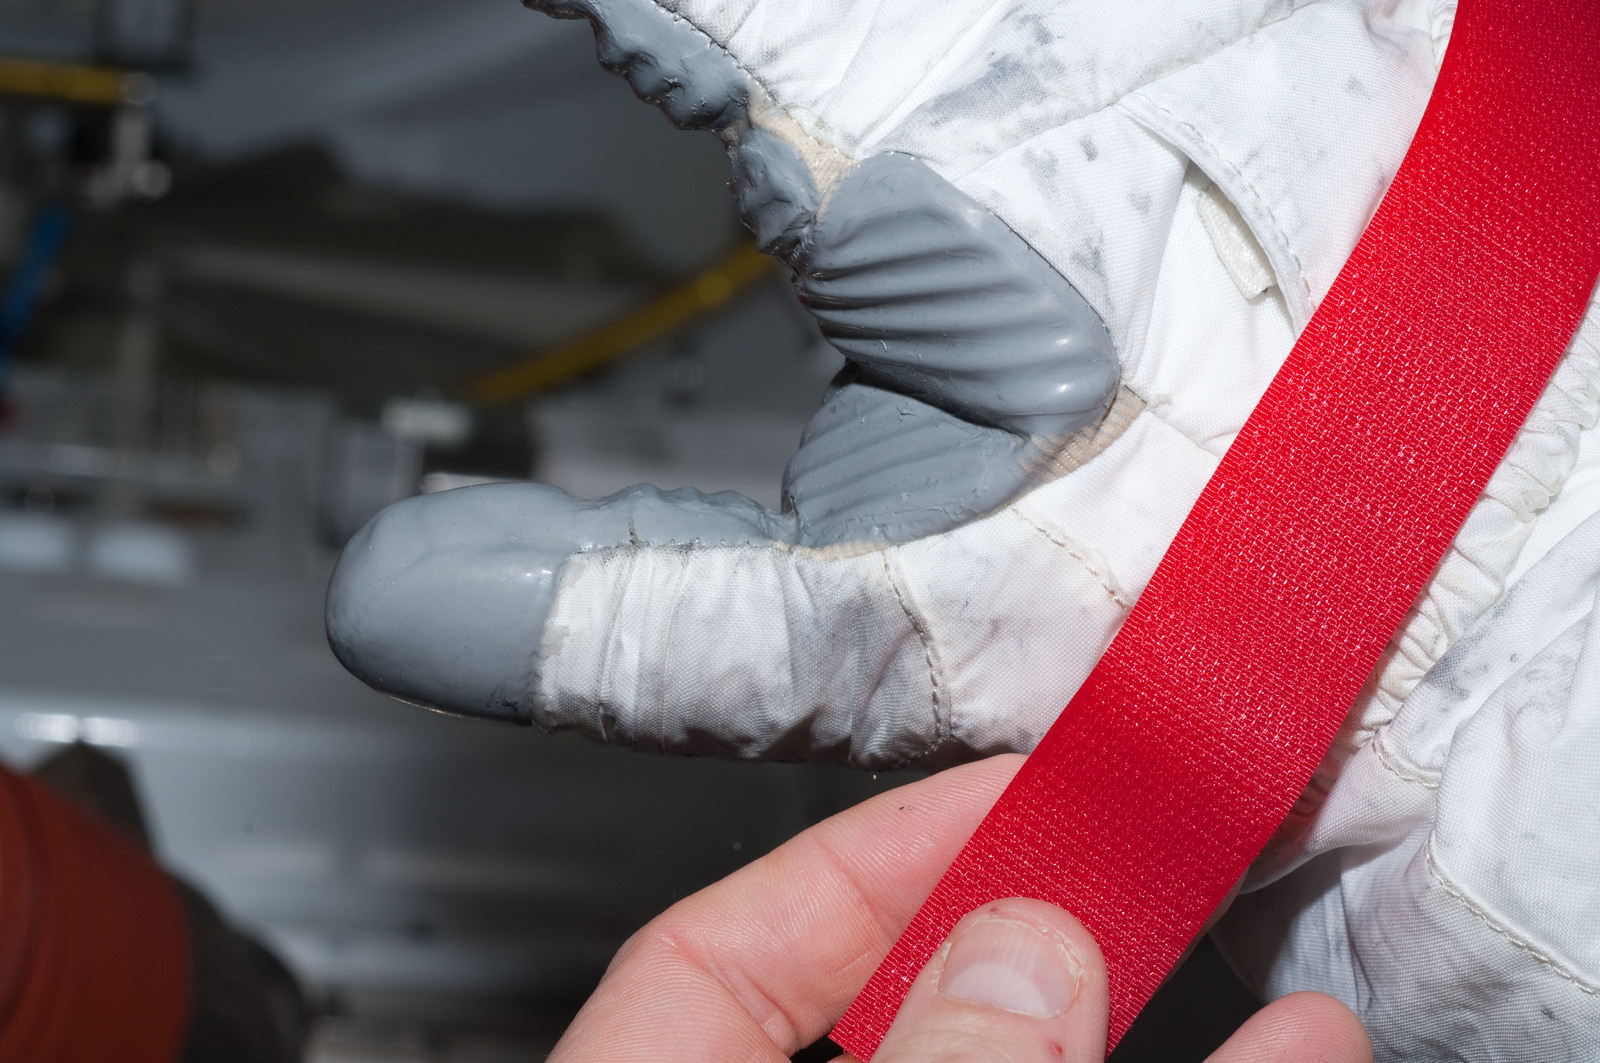 S126E007964 - STS-126 - Inspection of EMU Glove after EVA 1